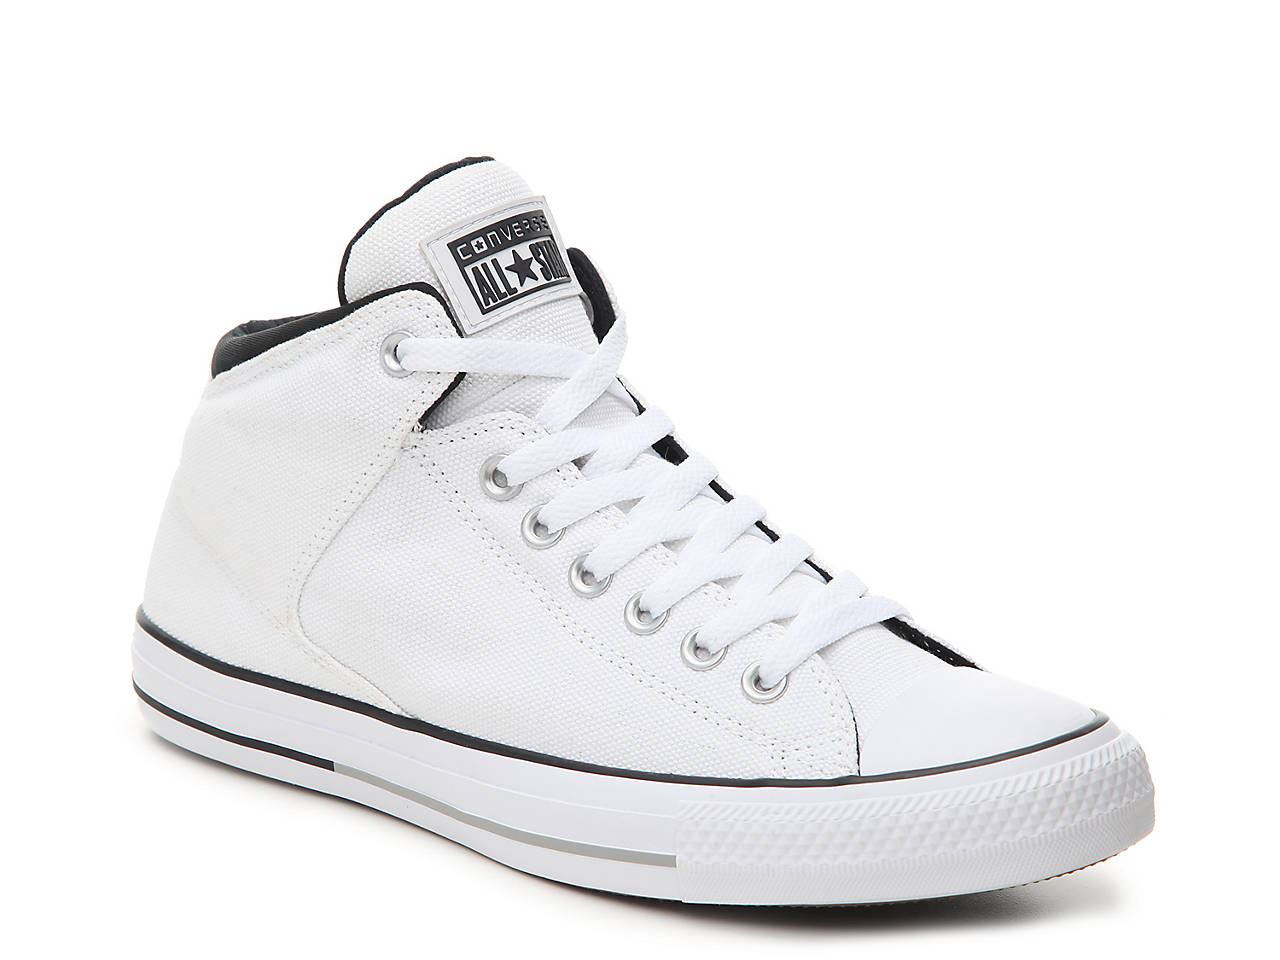 81b419f600eb Converse Chuck Taylor All Star Street High-Top Sneaker - Men s Men s ...